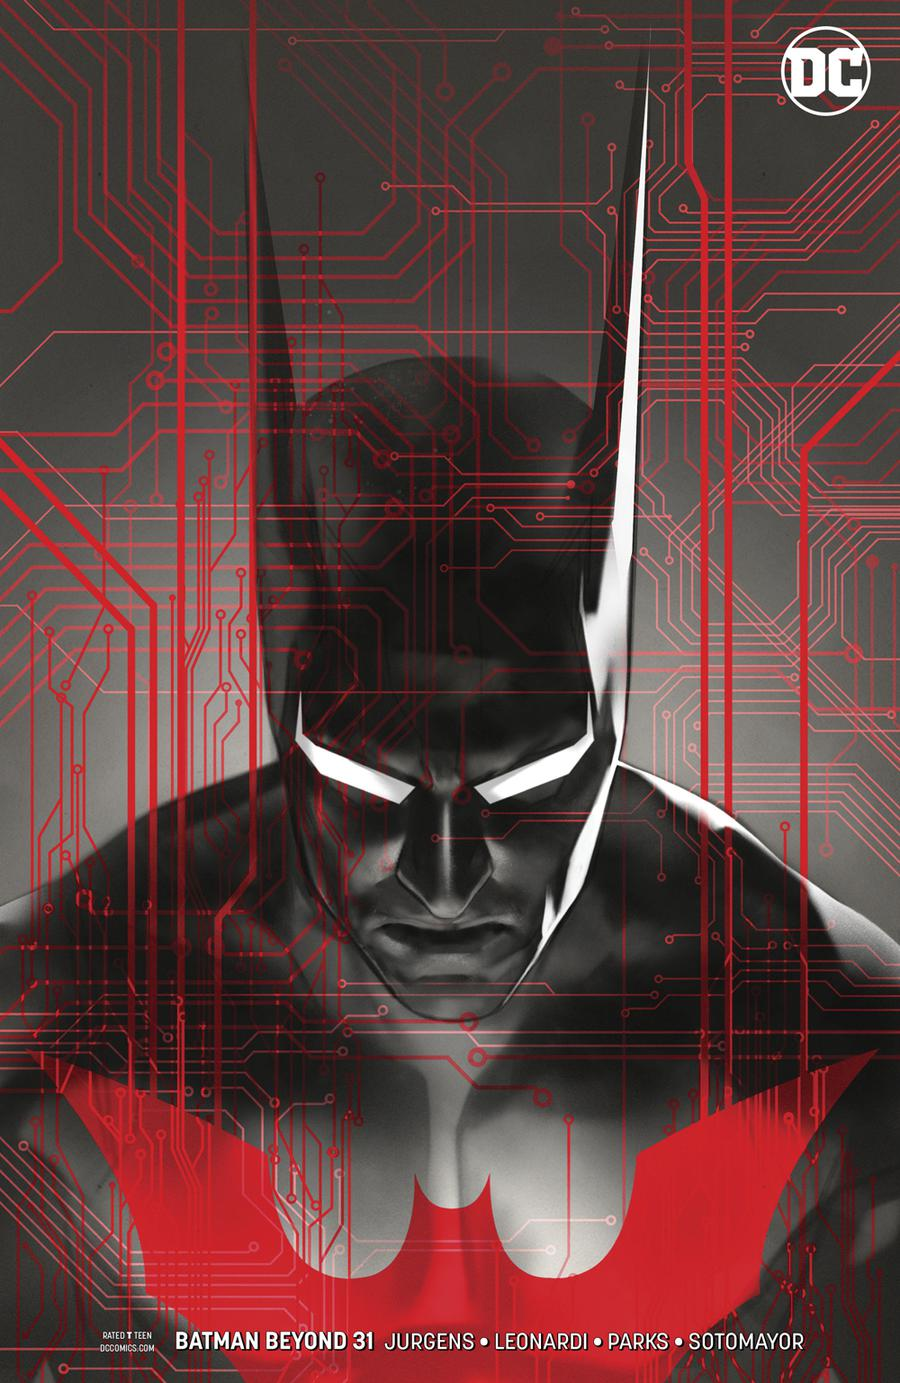 Batman Beyond Vol 6 #31 Cover B Variant Ben Oliver Cover